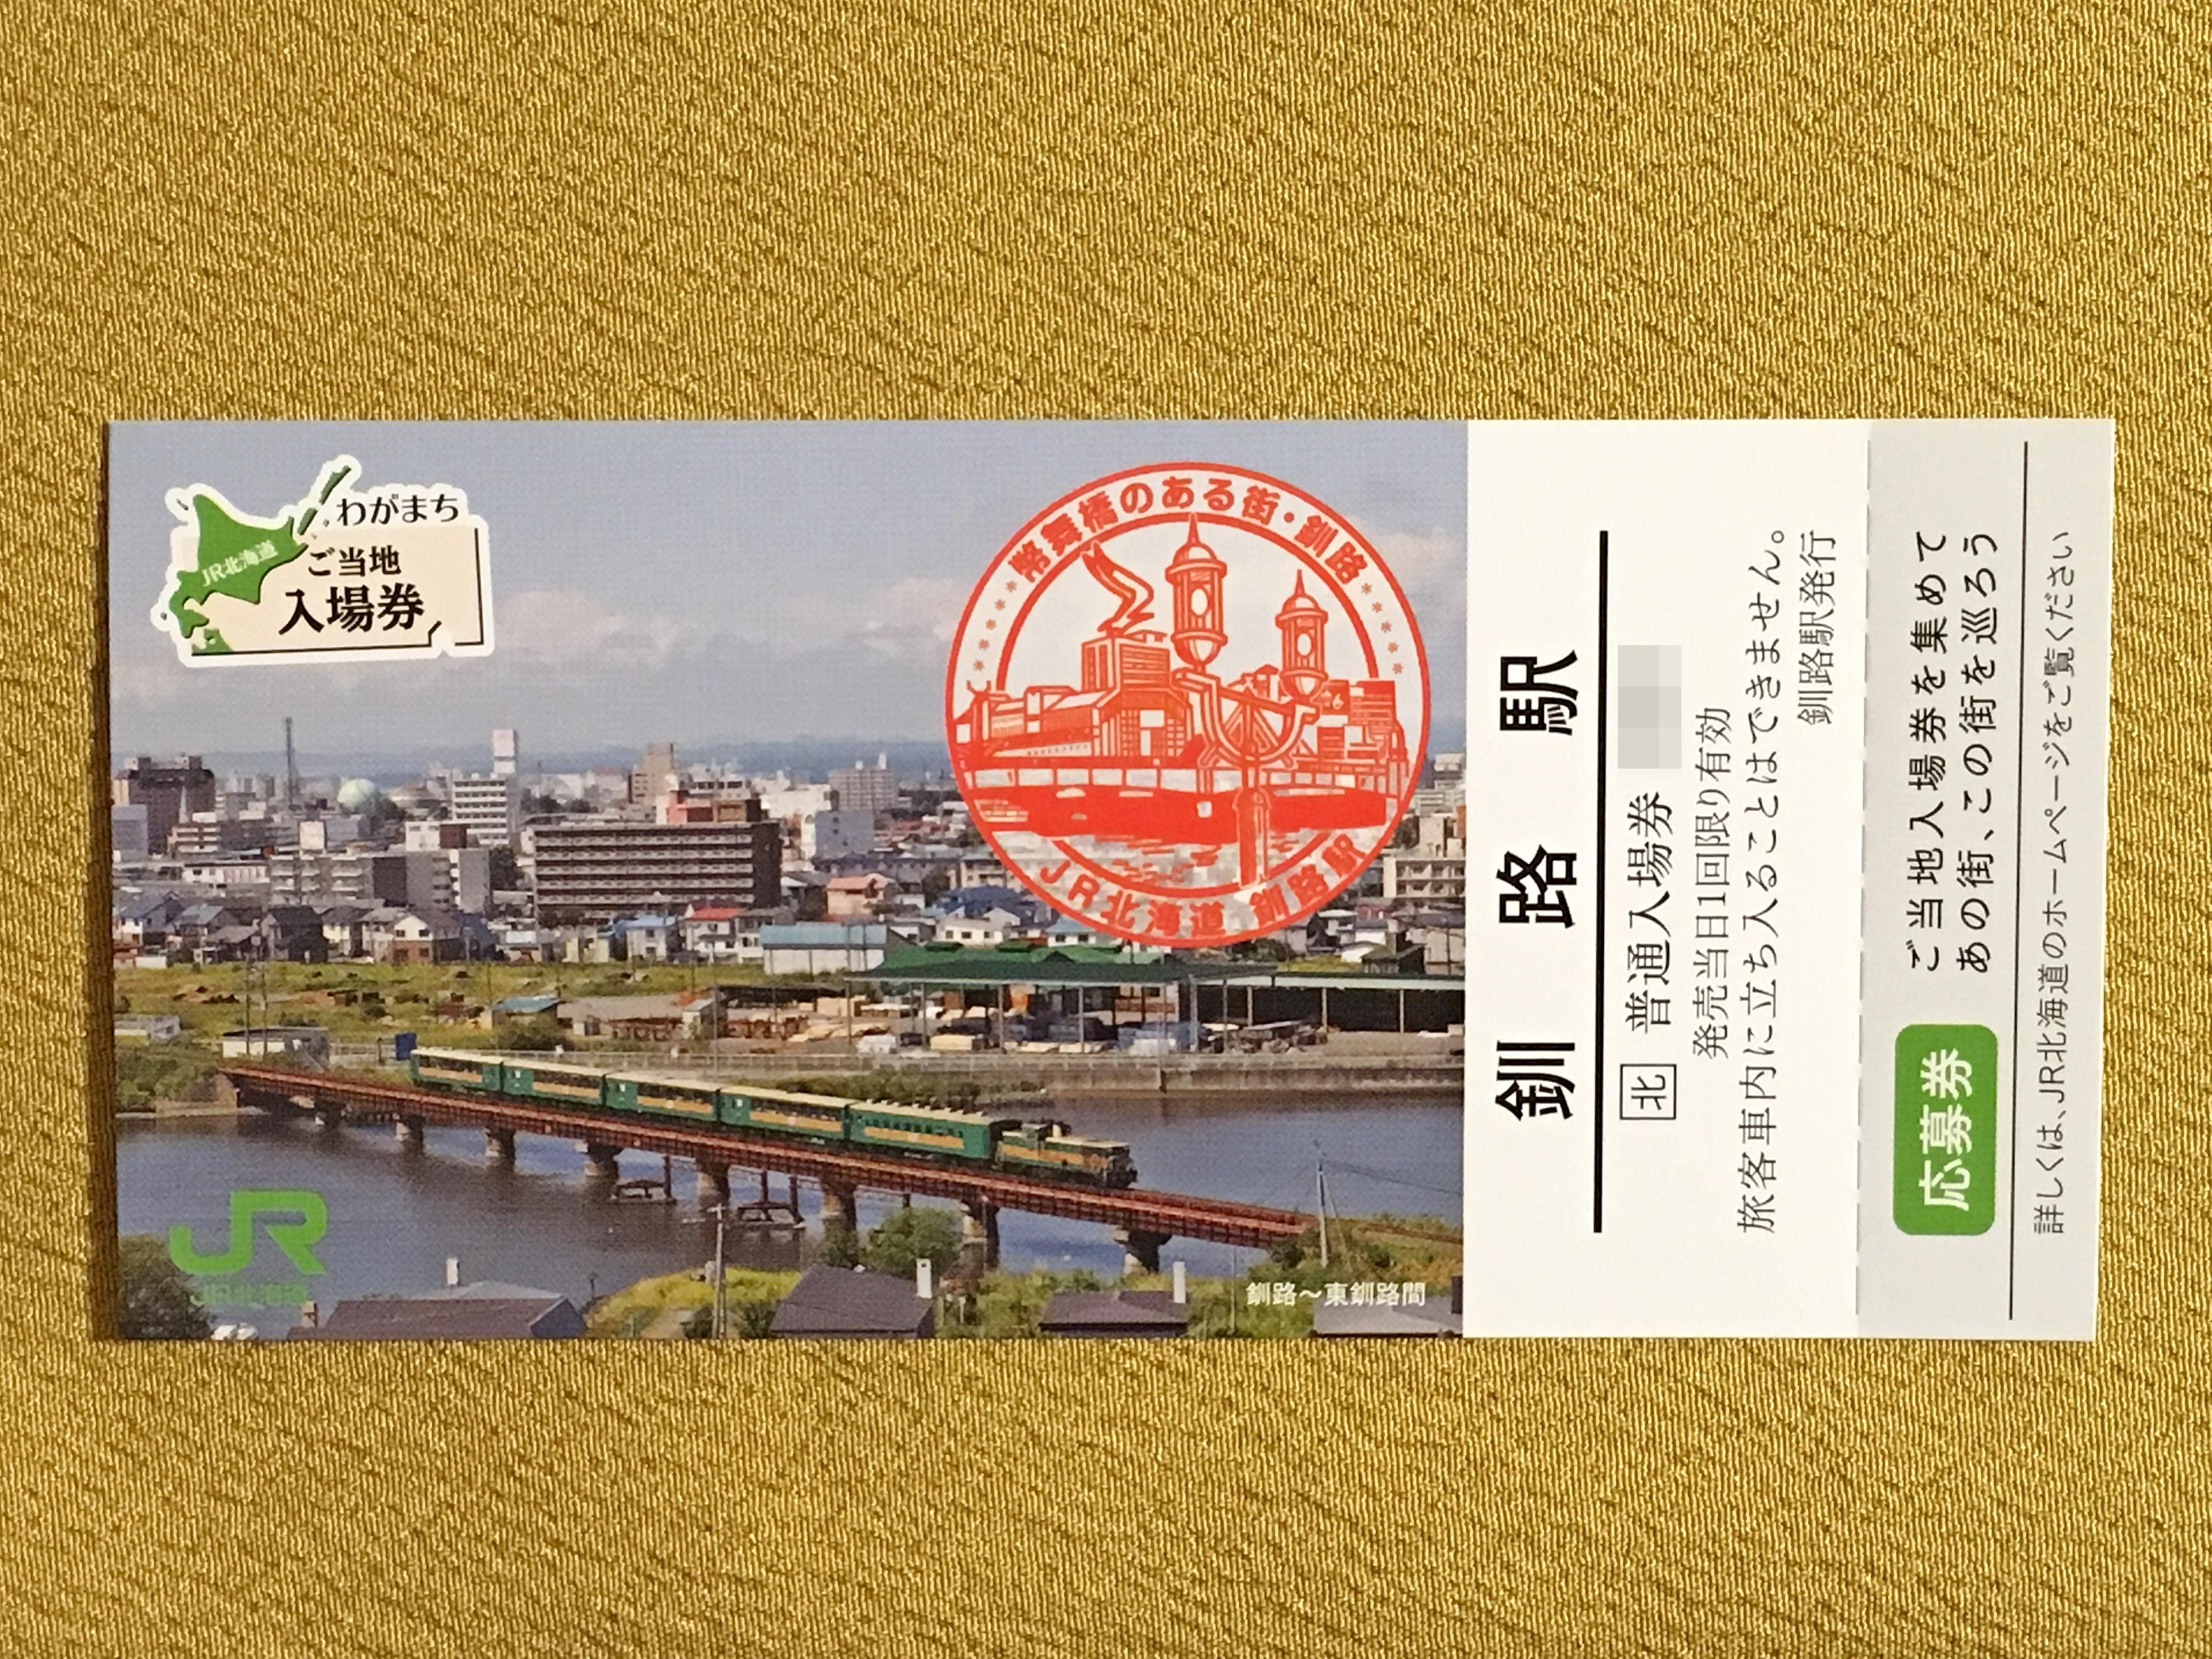 JR北海道ご当地入場券 釧路駅表.JPG